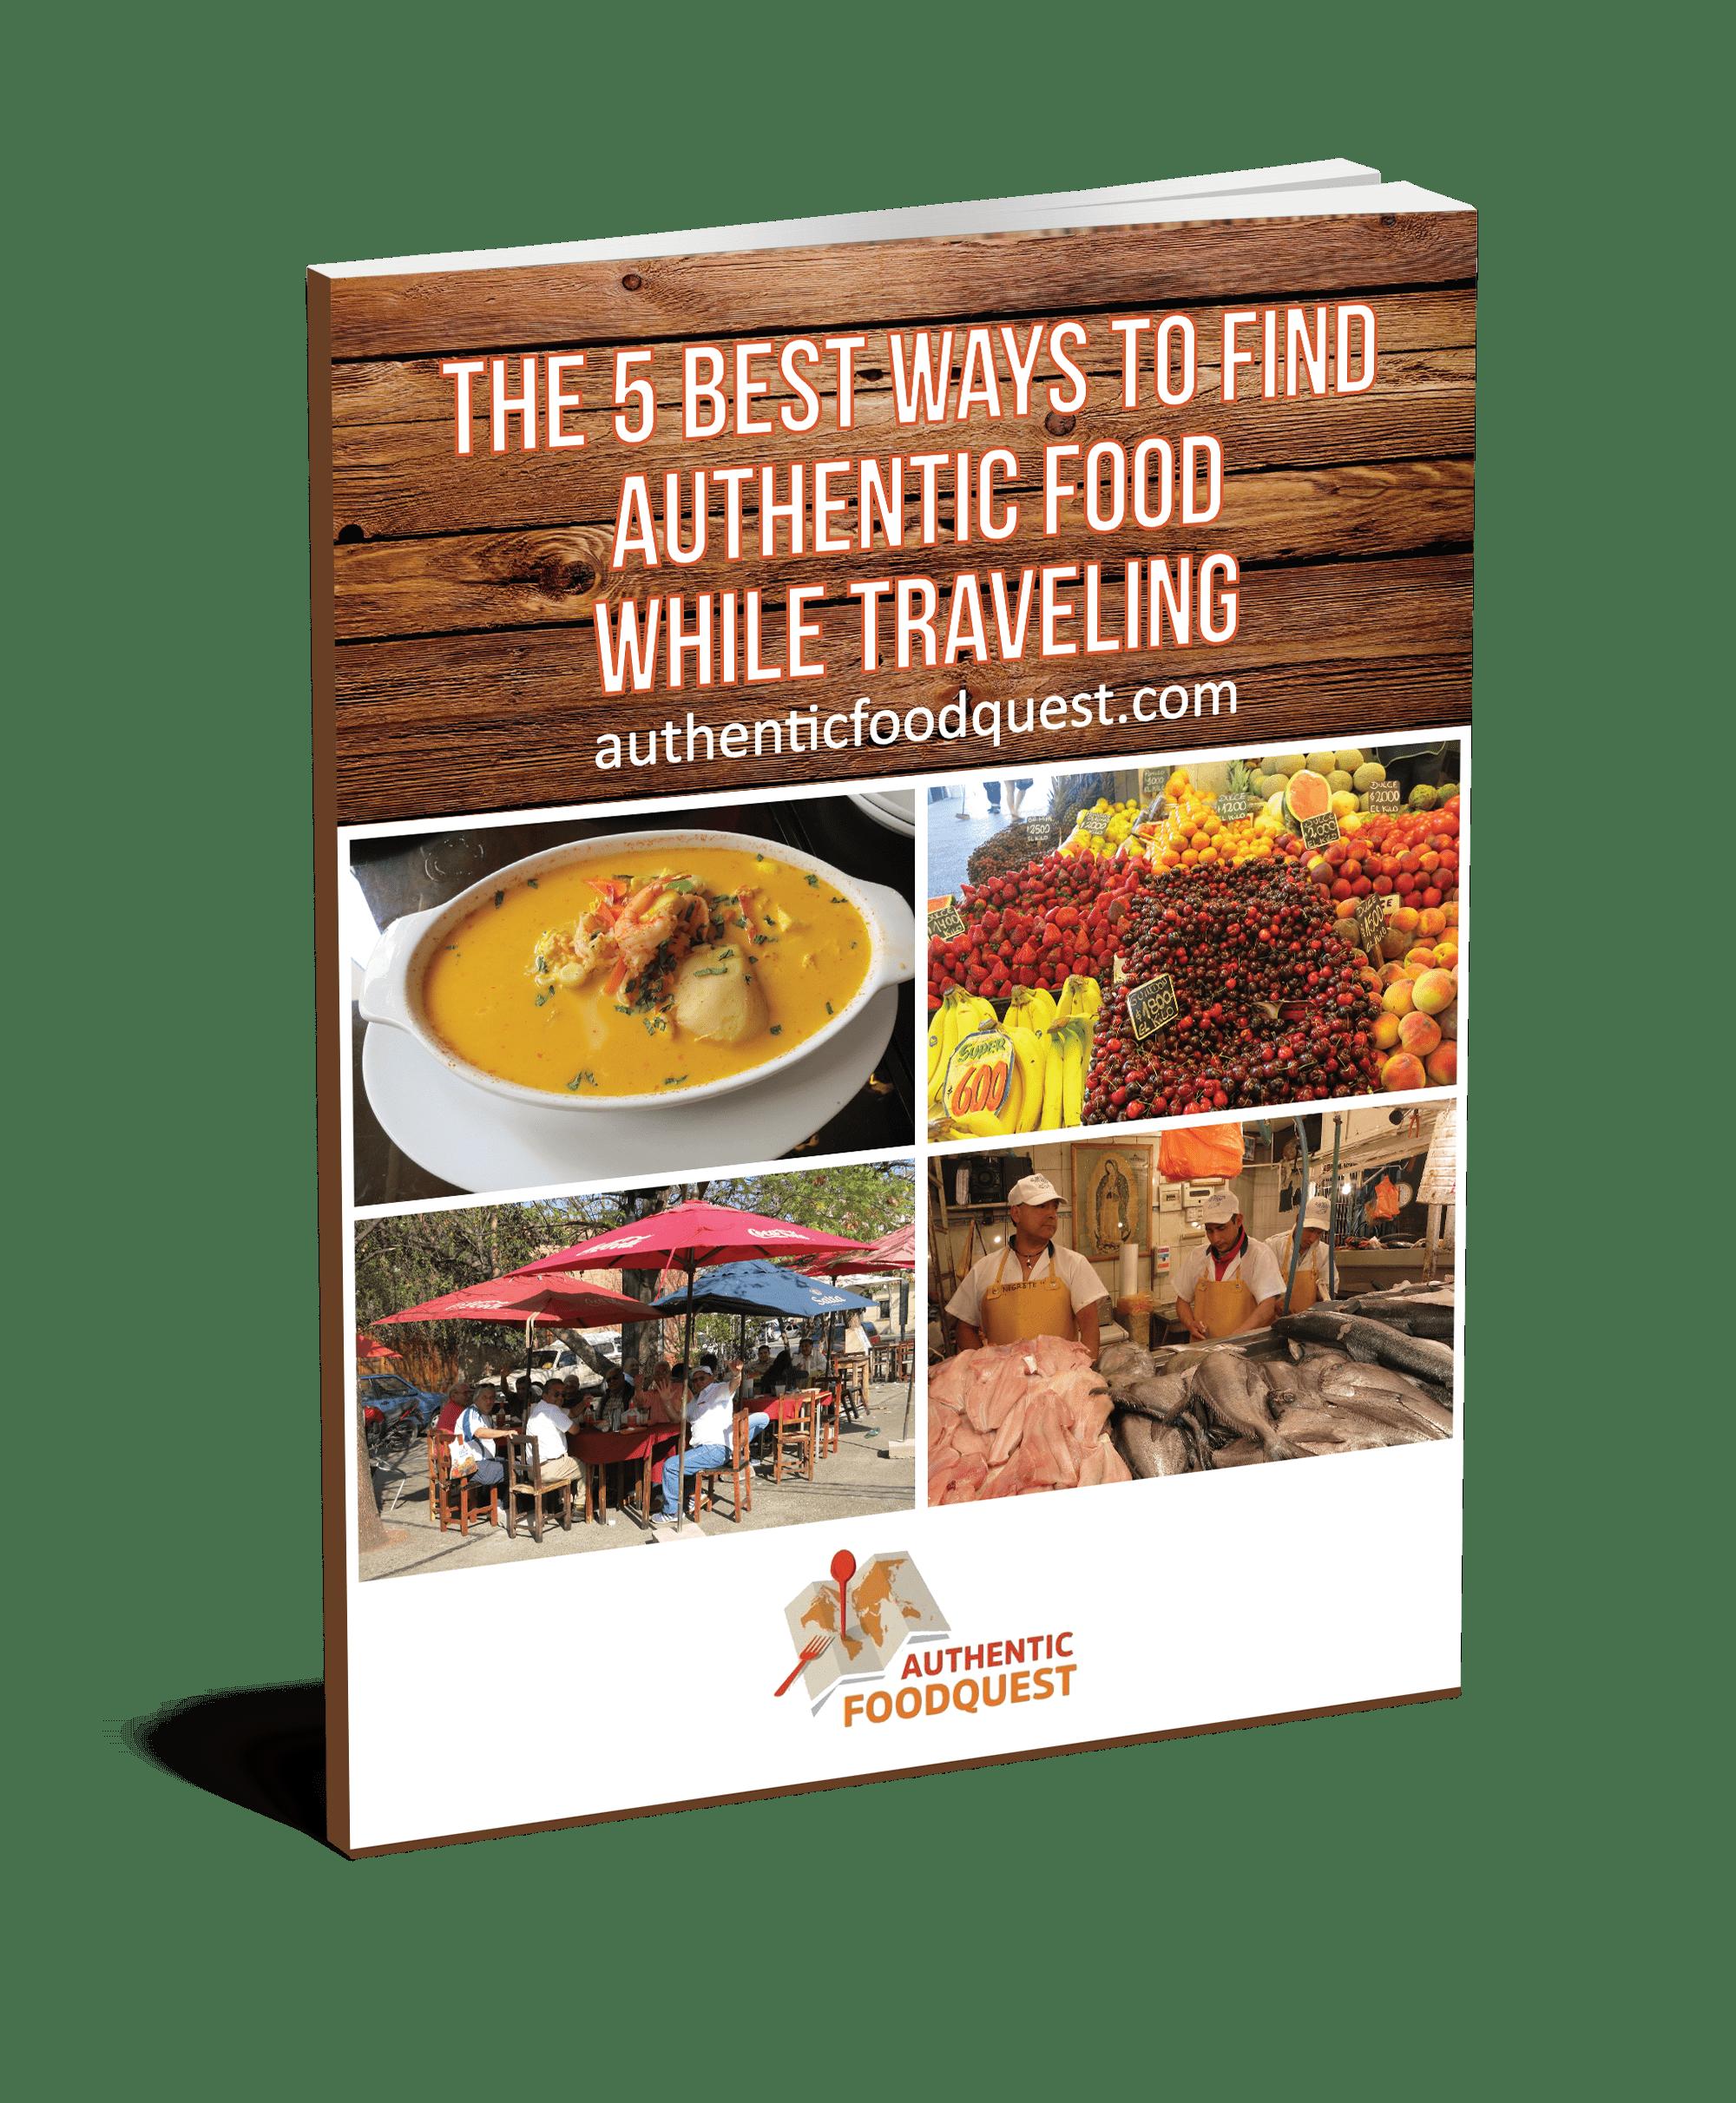 Authentic Food Experiences - Authentic Restaurant Experiences